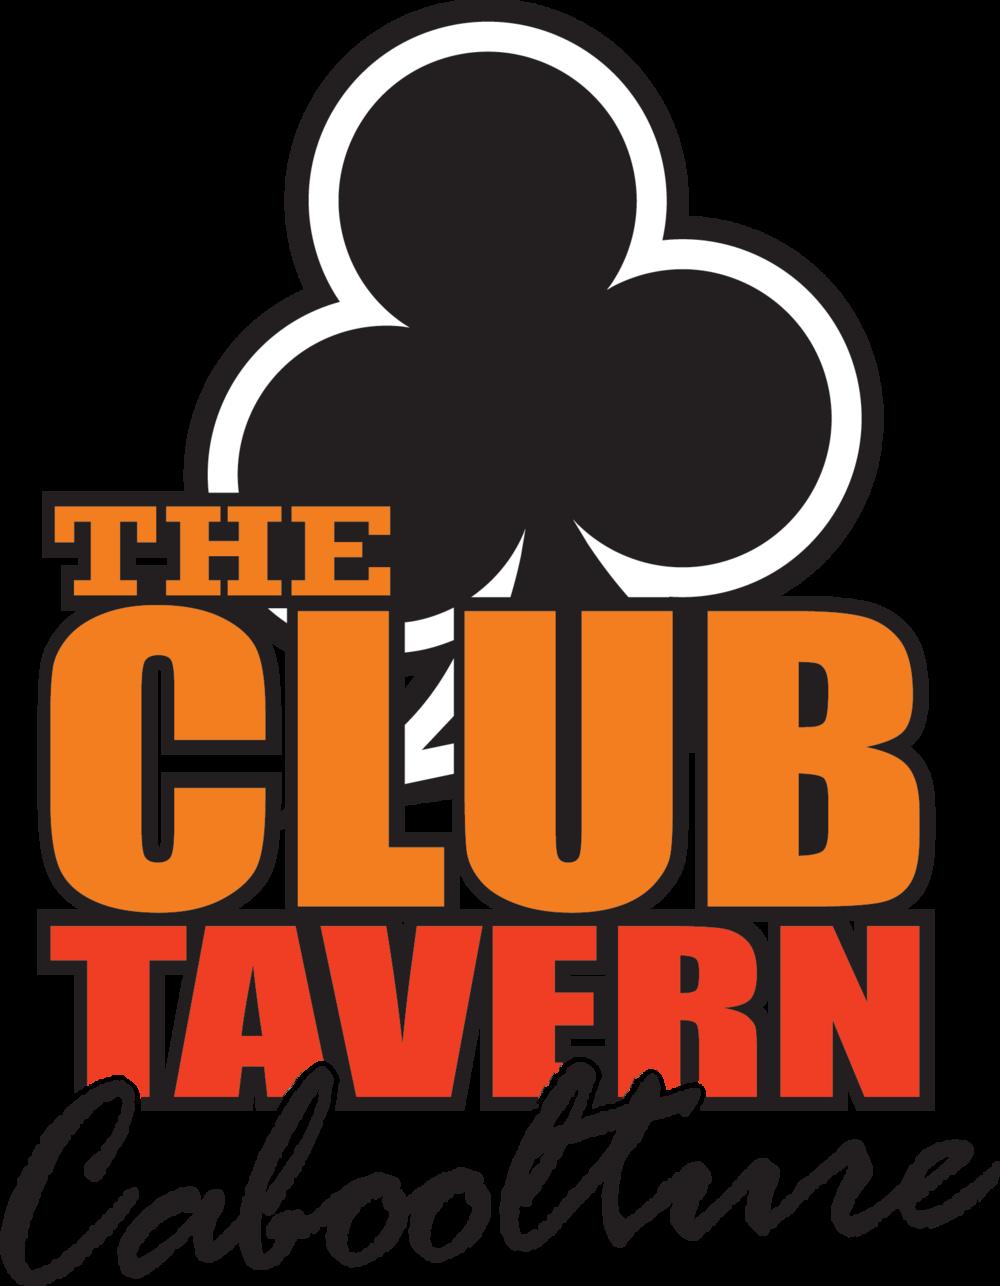 Club tavern caboolture qld. Dinner clipart dinner meeting